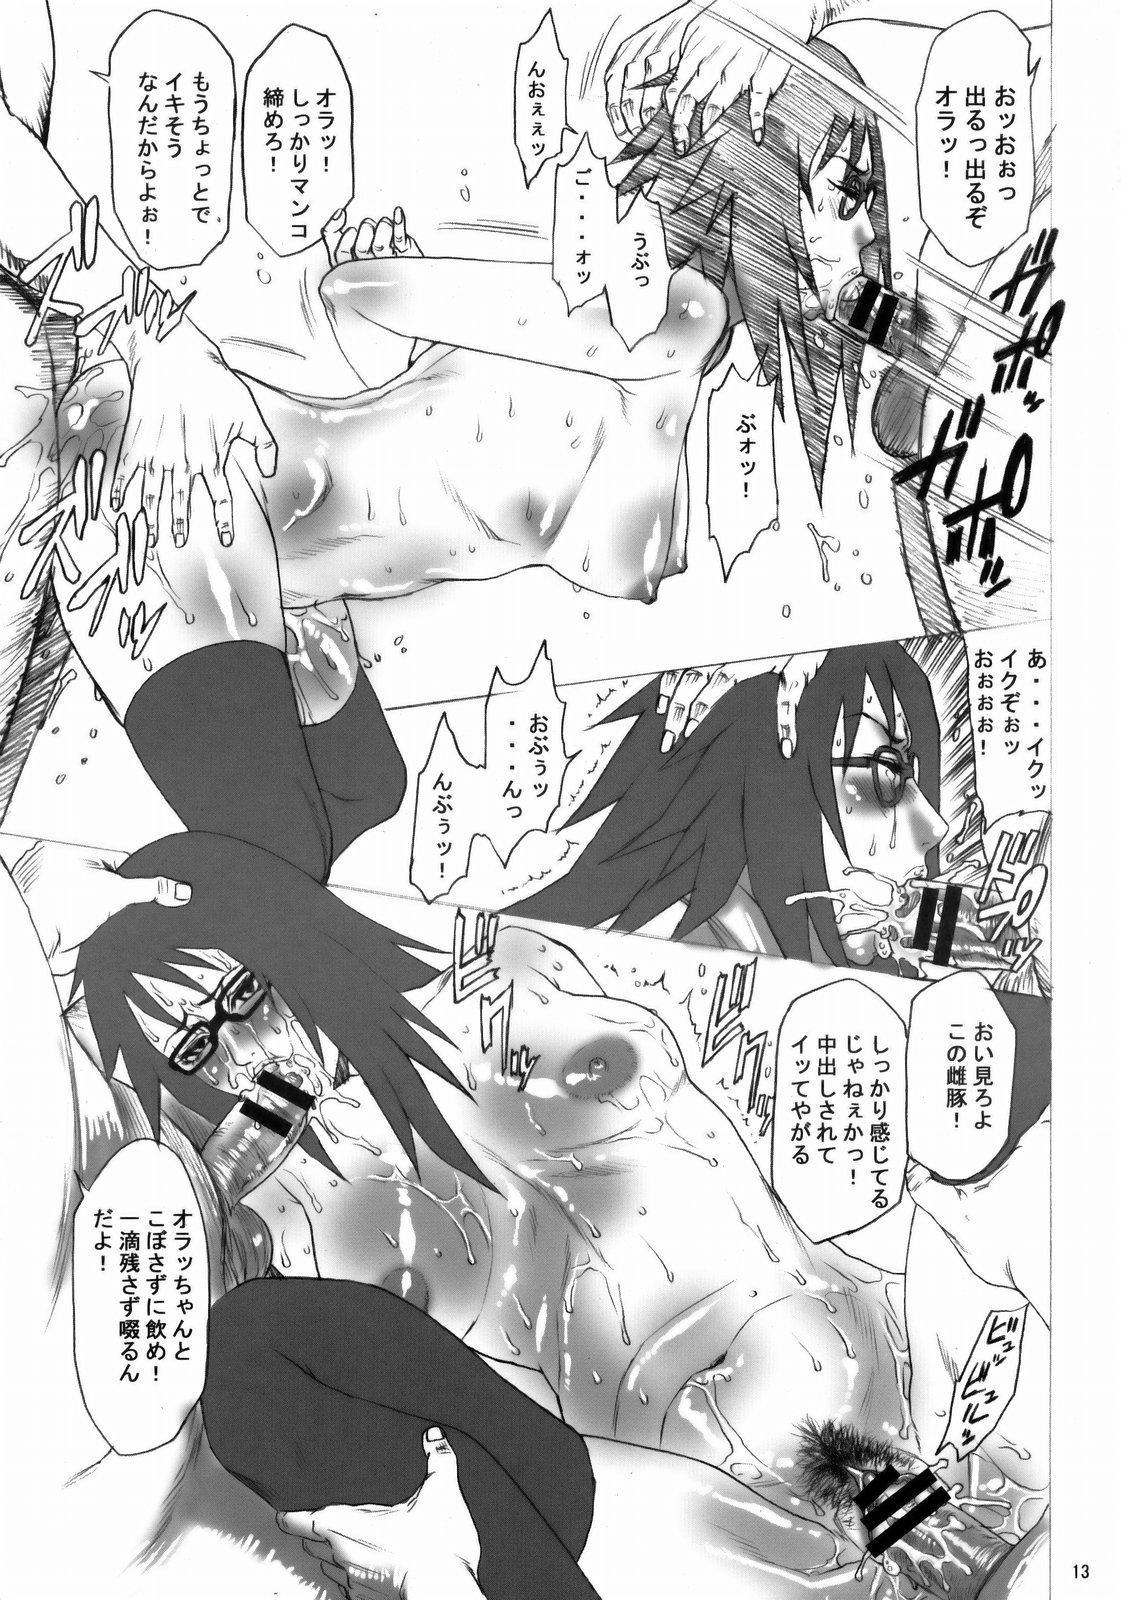 NINJA EXTREME 3 Onna Goroshi Shippuuden 11